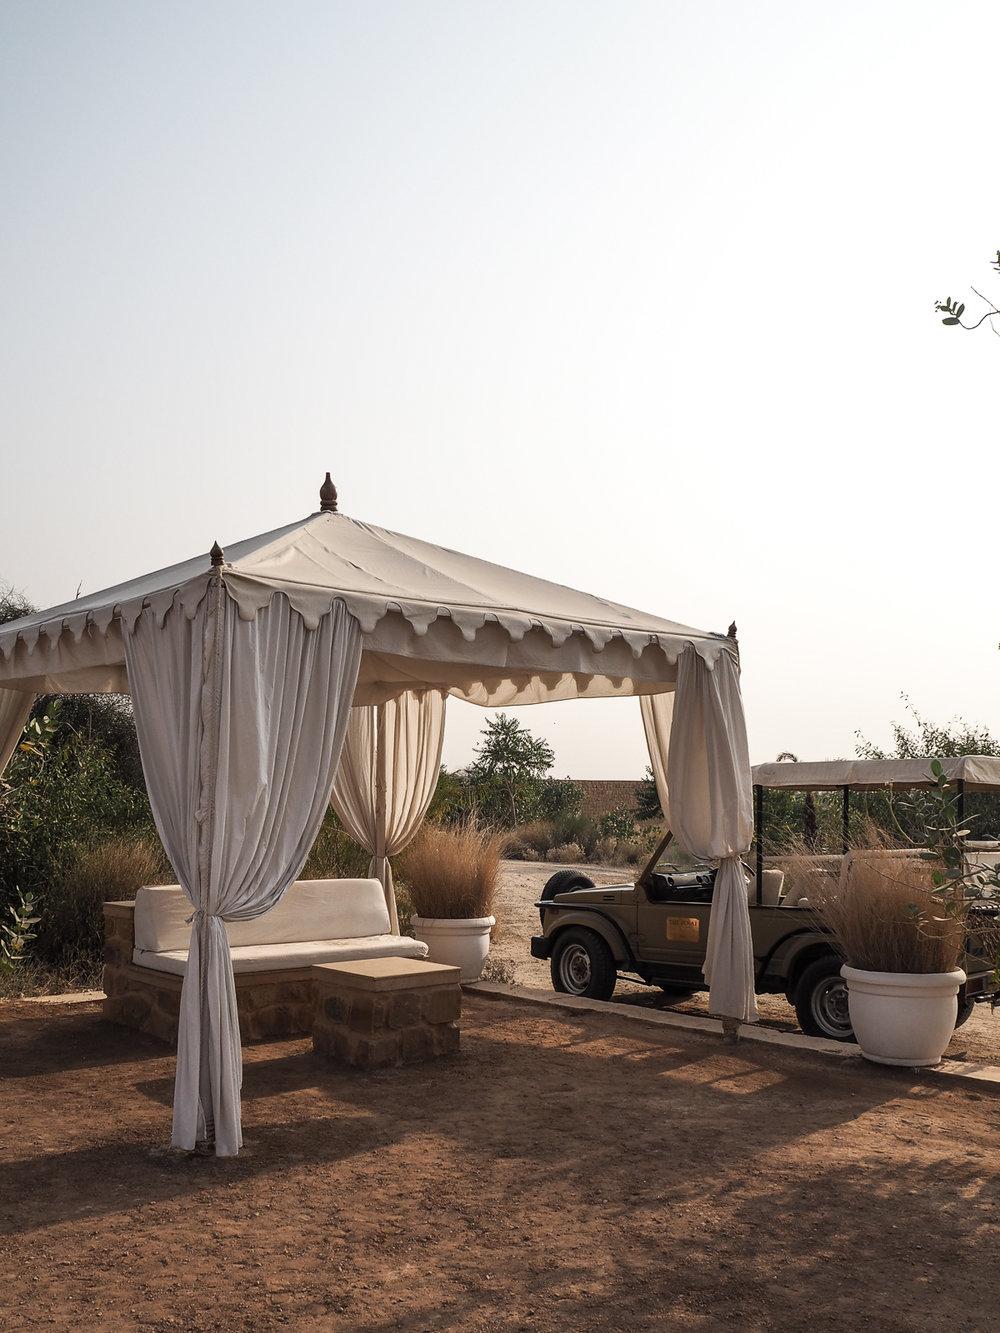 Fashion-Me-Now-Rajasthan-Road-Trip-Jaisalmer-the-Desert_-16.jpg